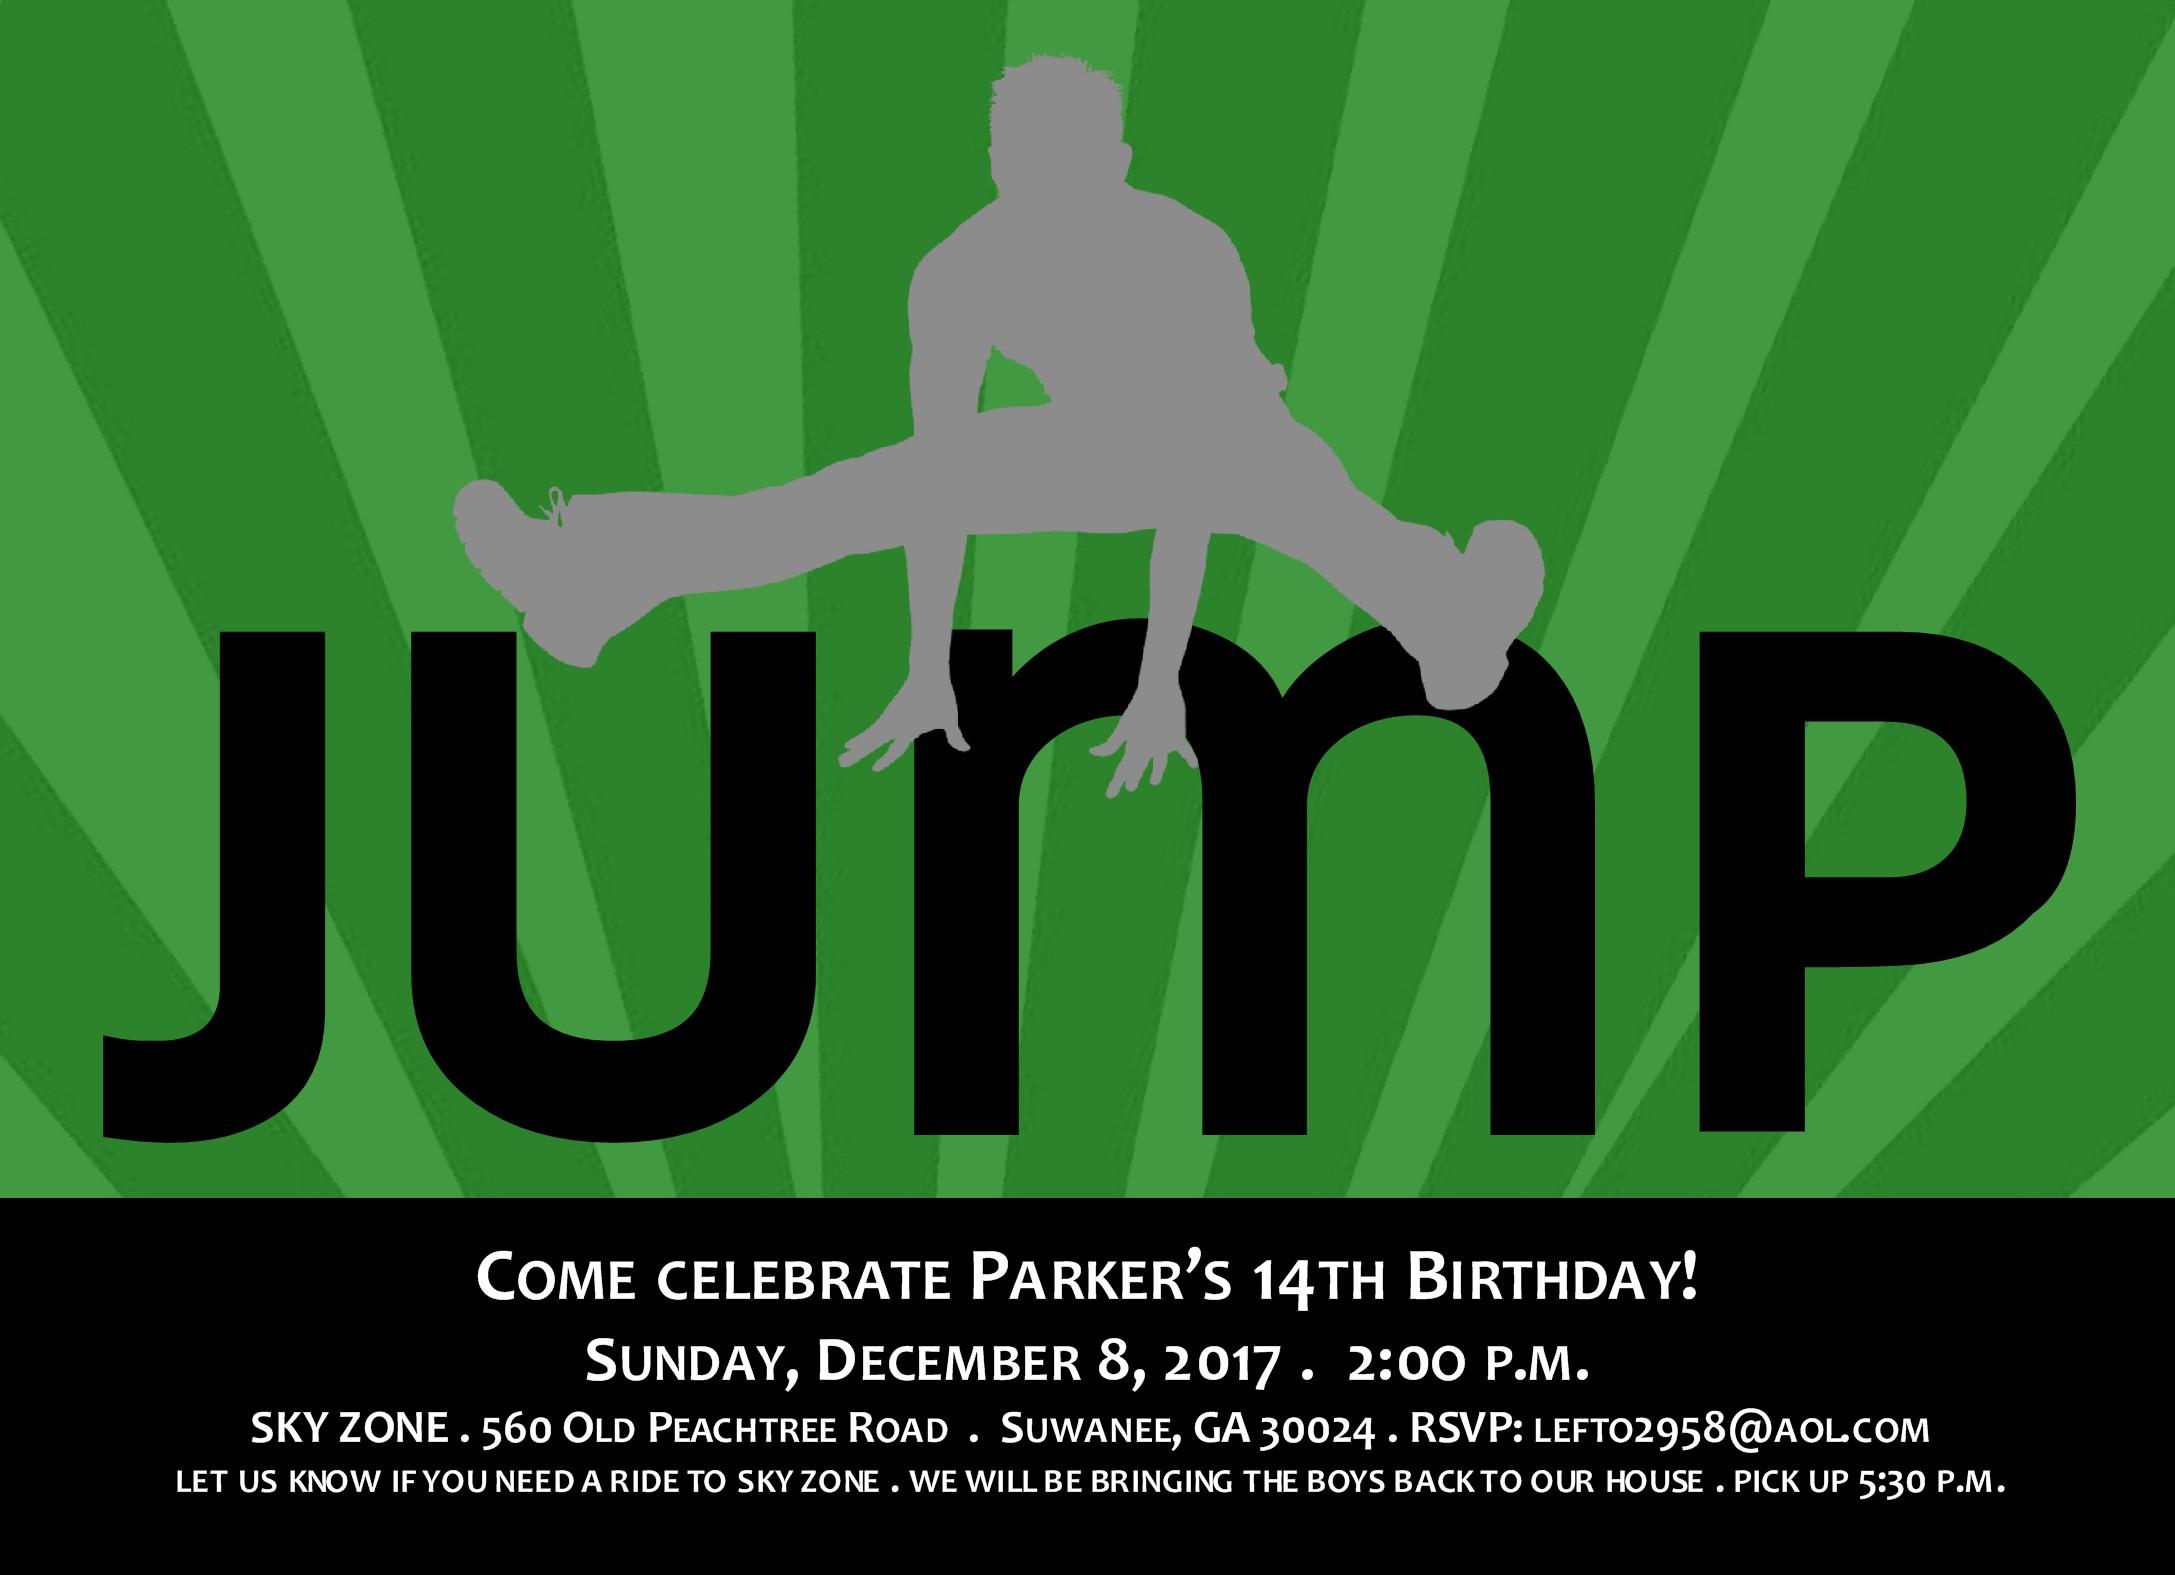 jump party birthday invitation